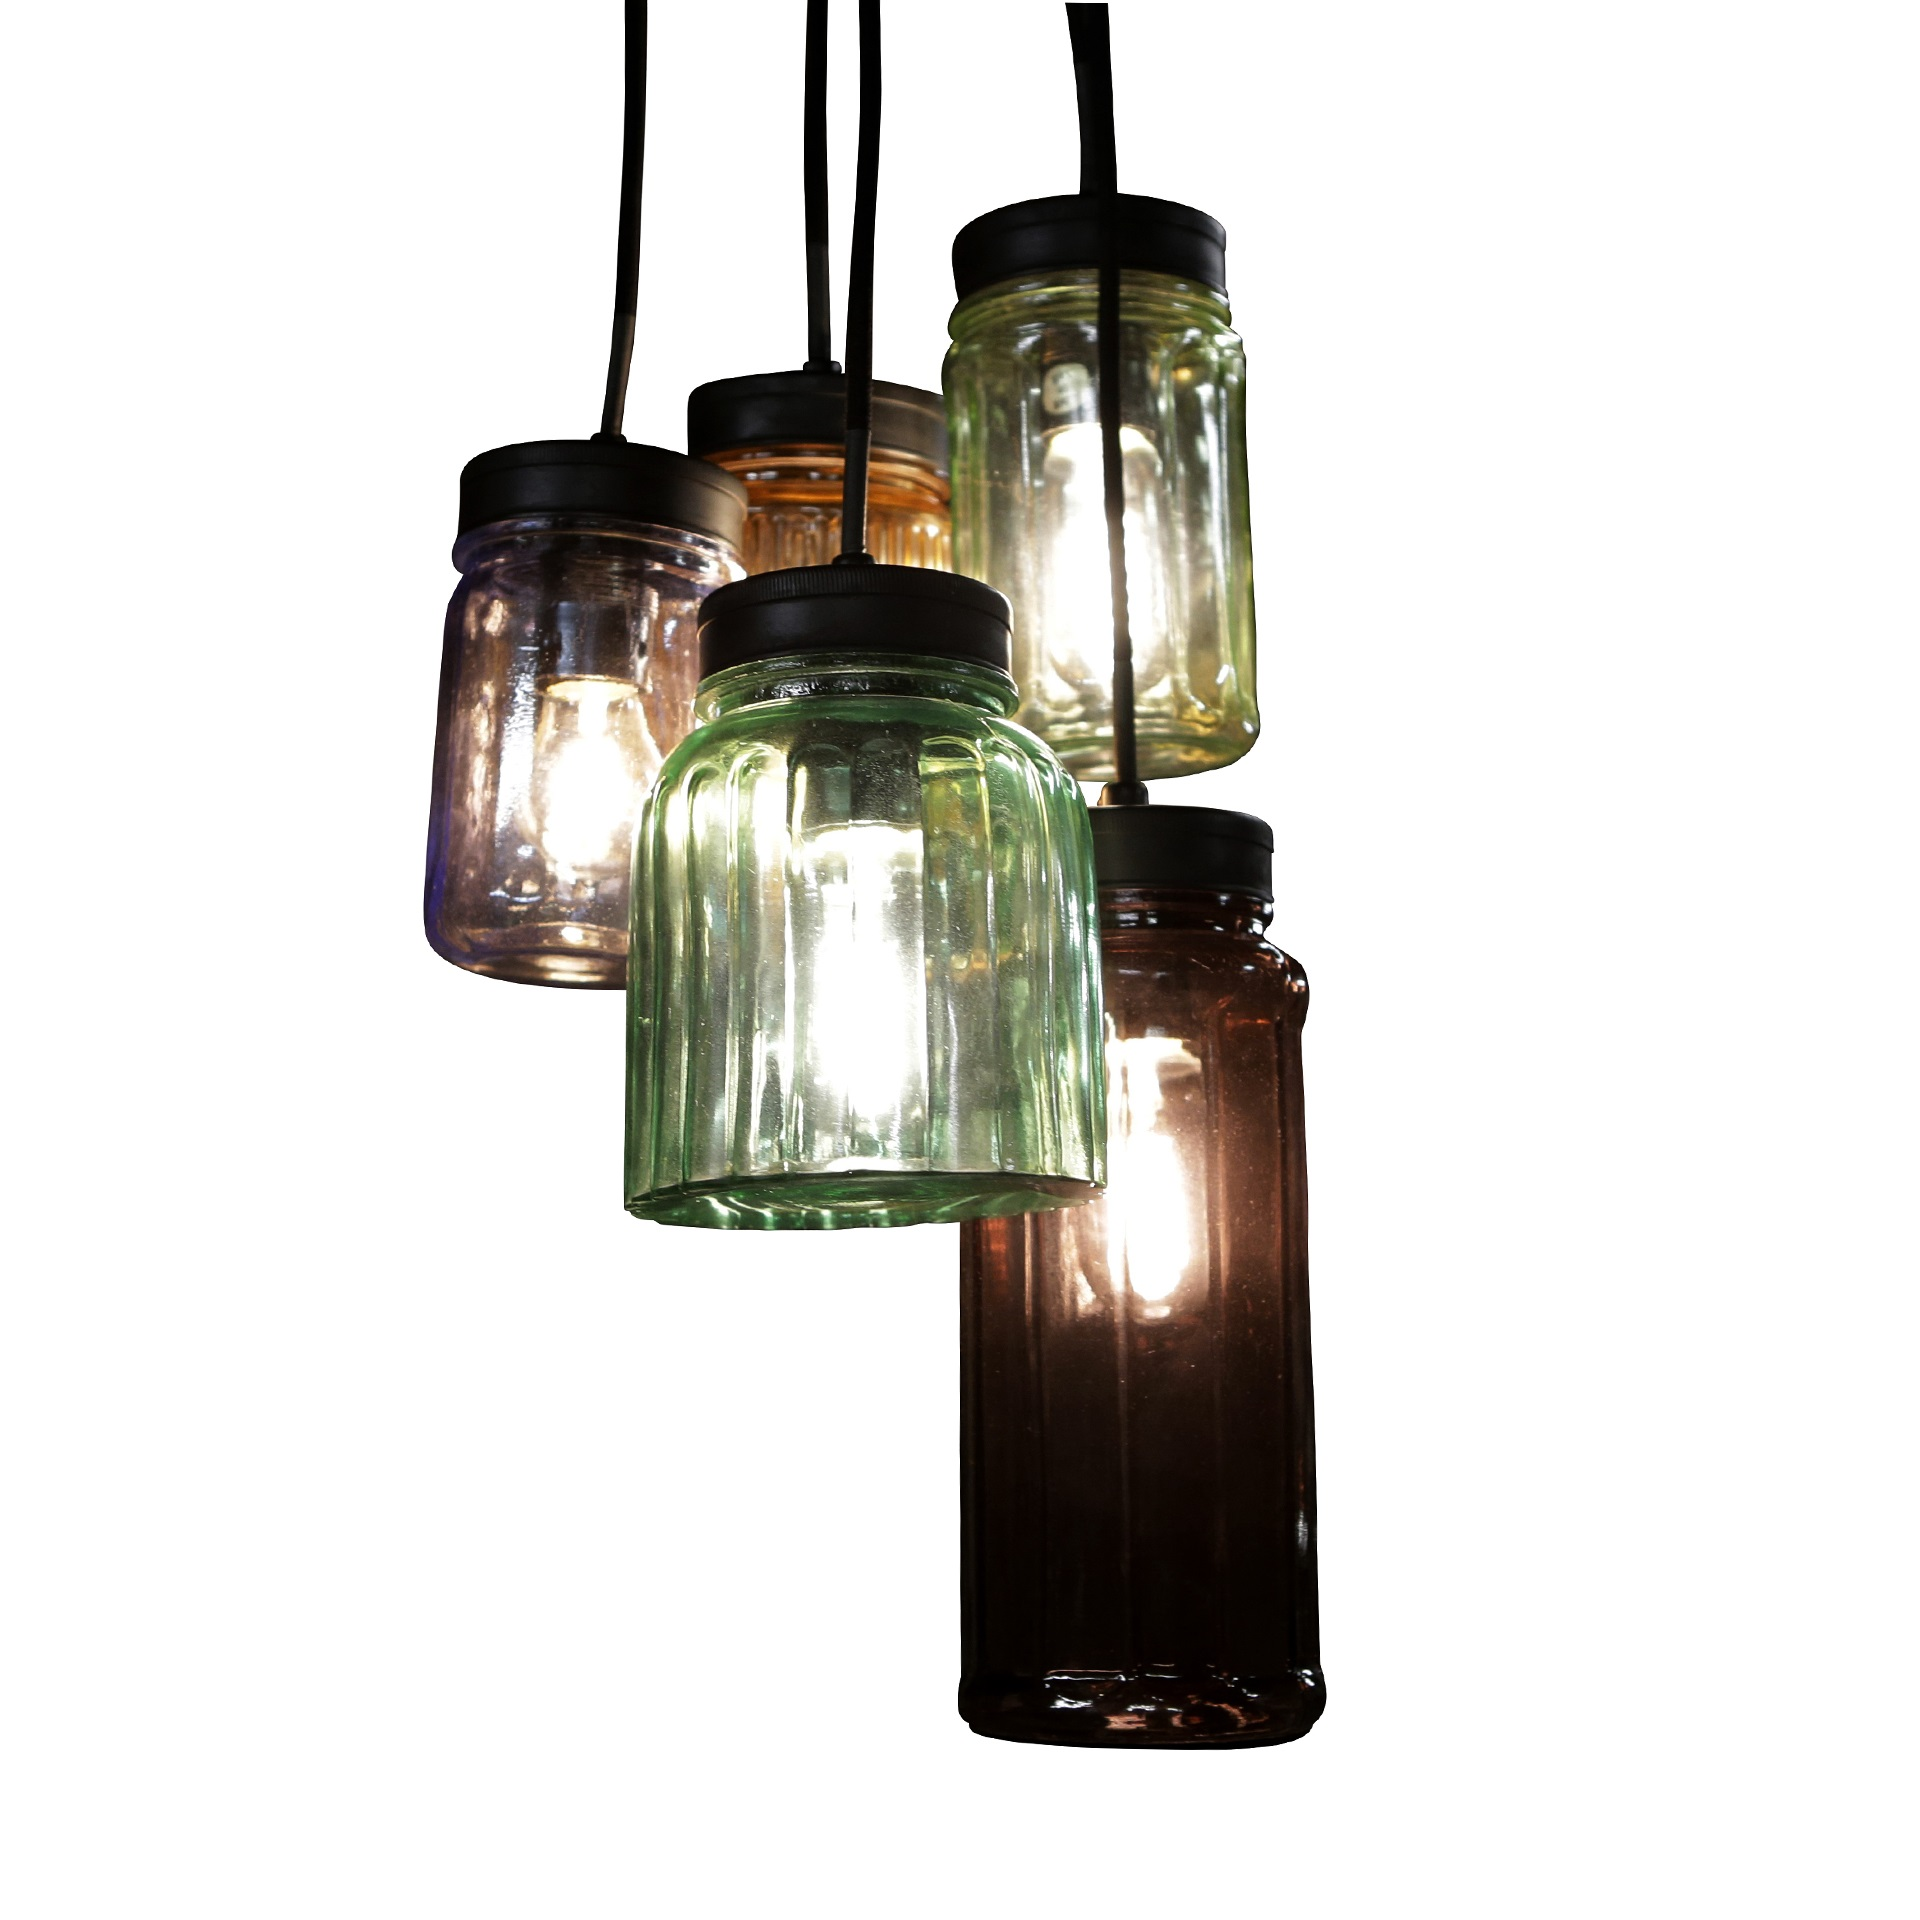 gekleurde glazen hanglampen